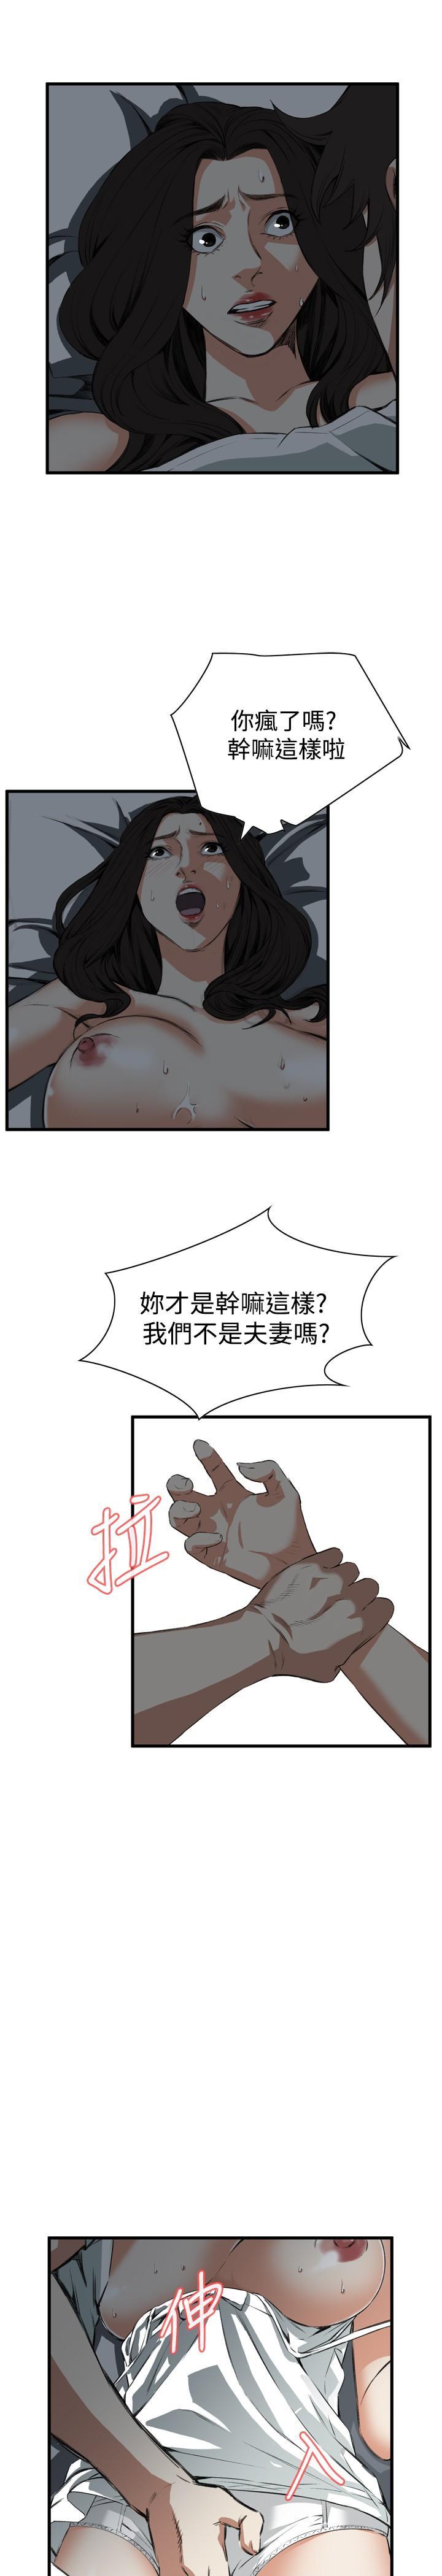 Take a Peek 偷窥 Ch.39~60 [Chinese]中文 196